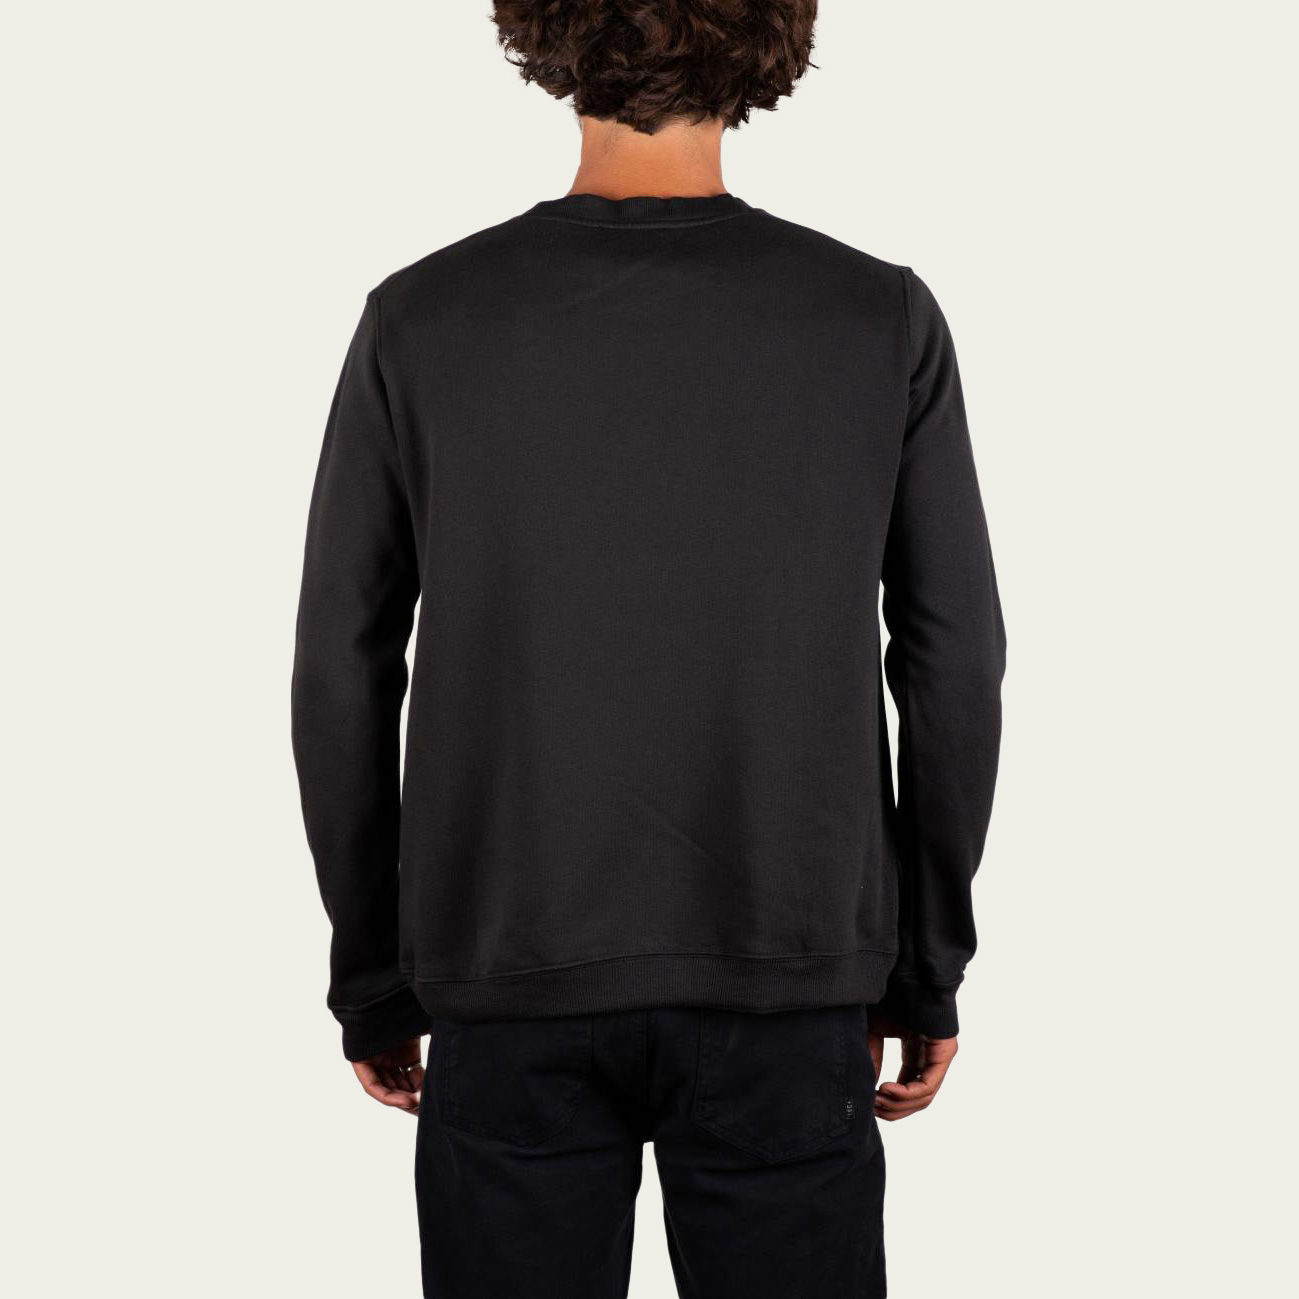 Charcoal and Sand +351 Sweatshirt | Bombinate